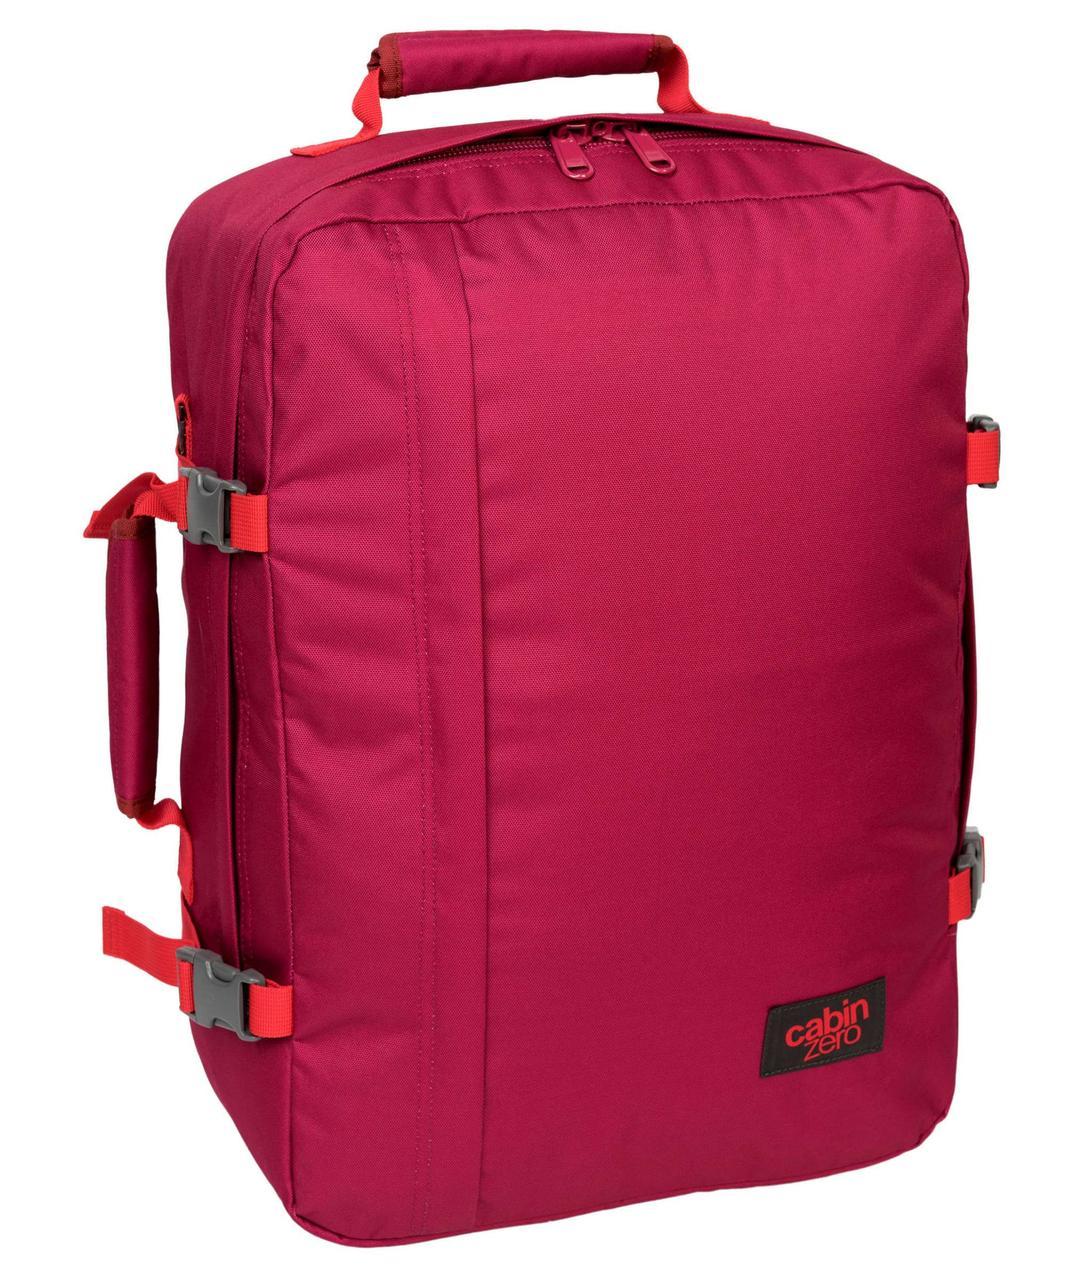 Сумка рюкзак Cabin zero Cz06-1806 розовый 44 л